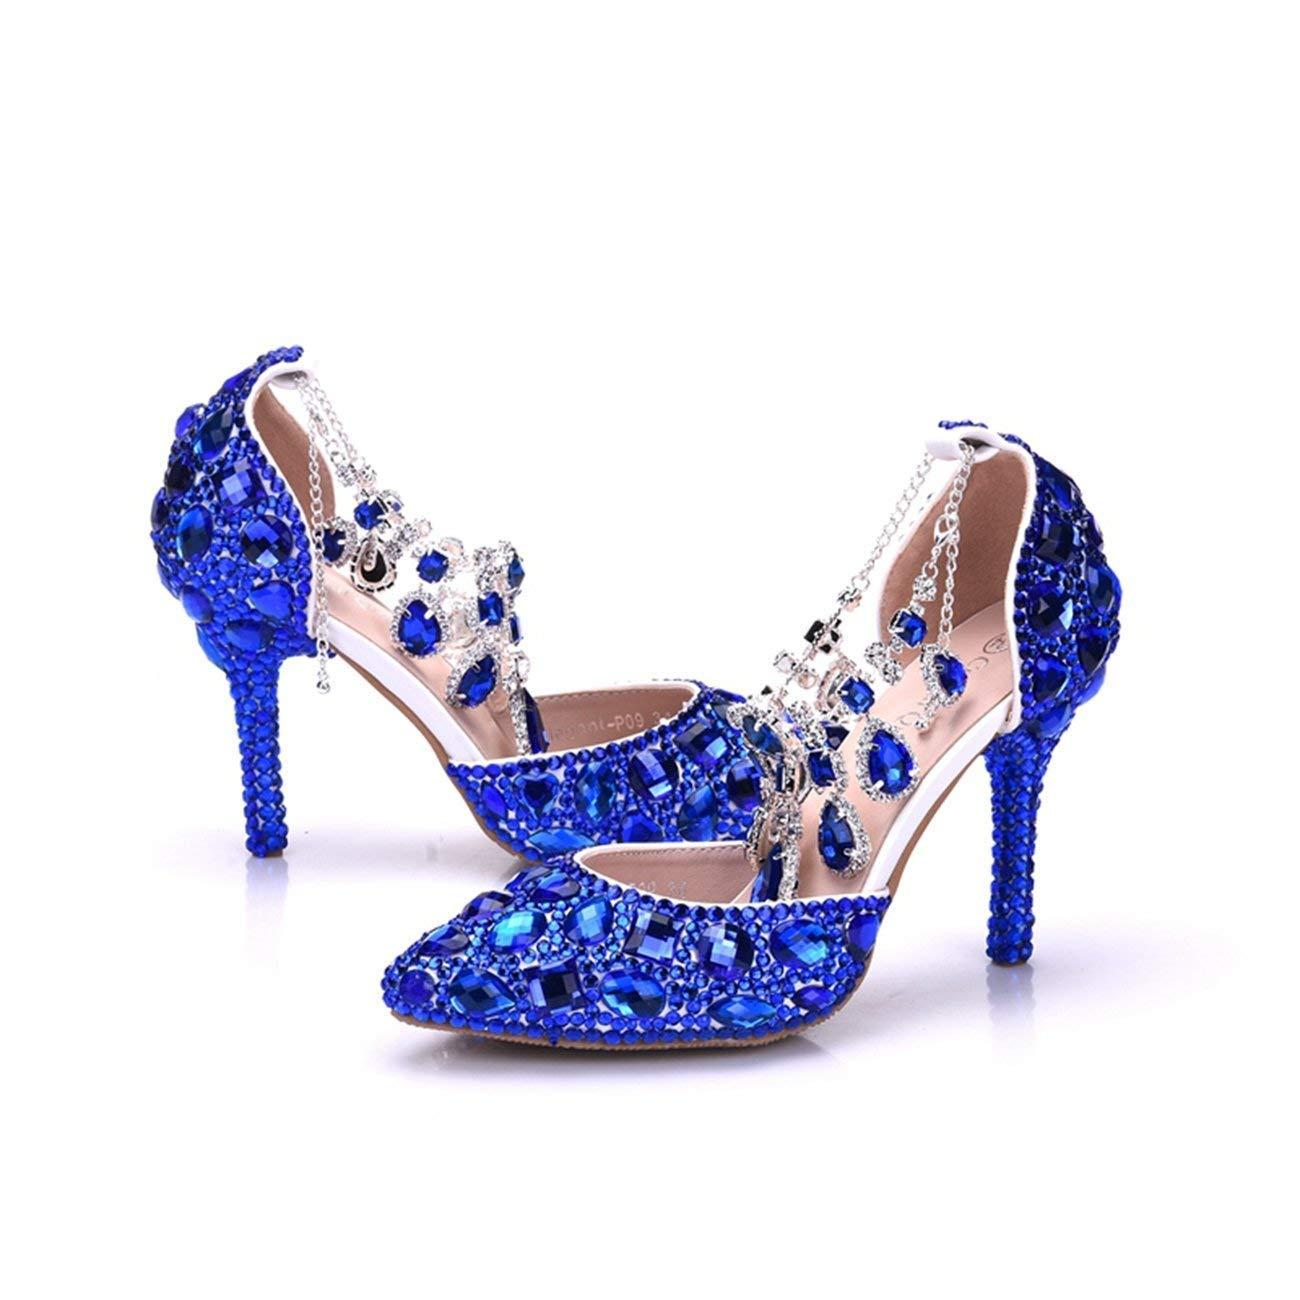 Qiusa Damen Damen Damen Strass Kristalle Perlen Knöchel Ketten blau Braut Hochzeit Schuhe UK 3 (Farbe   - Größe   -) a0e039